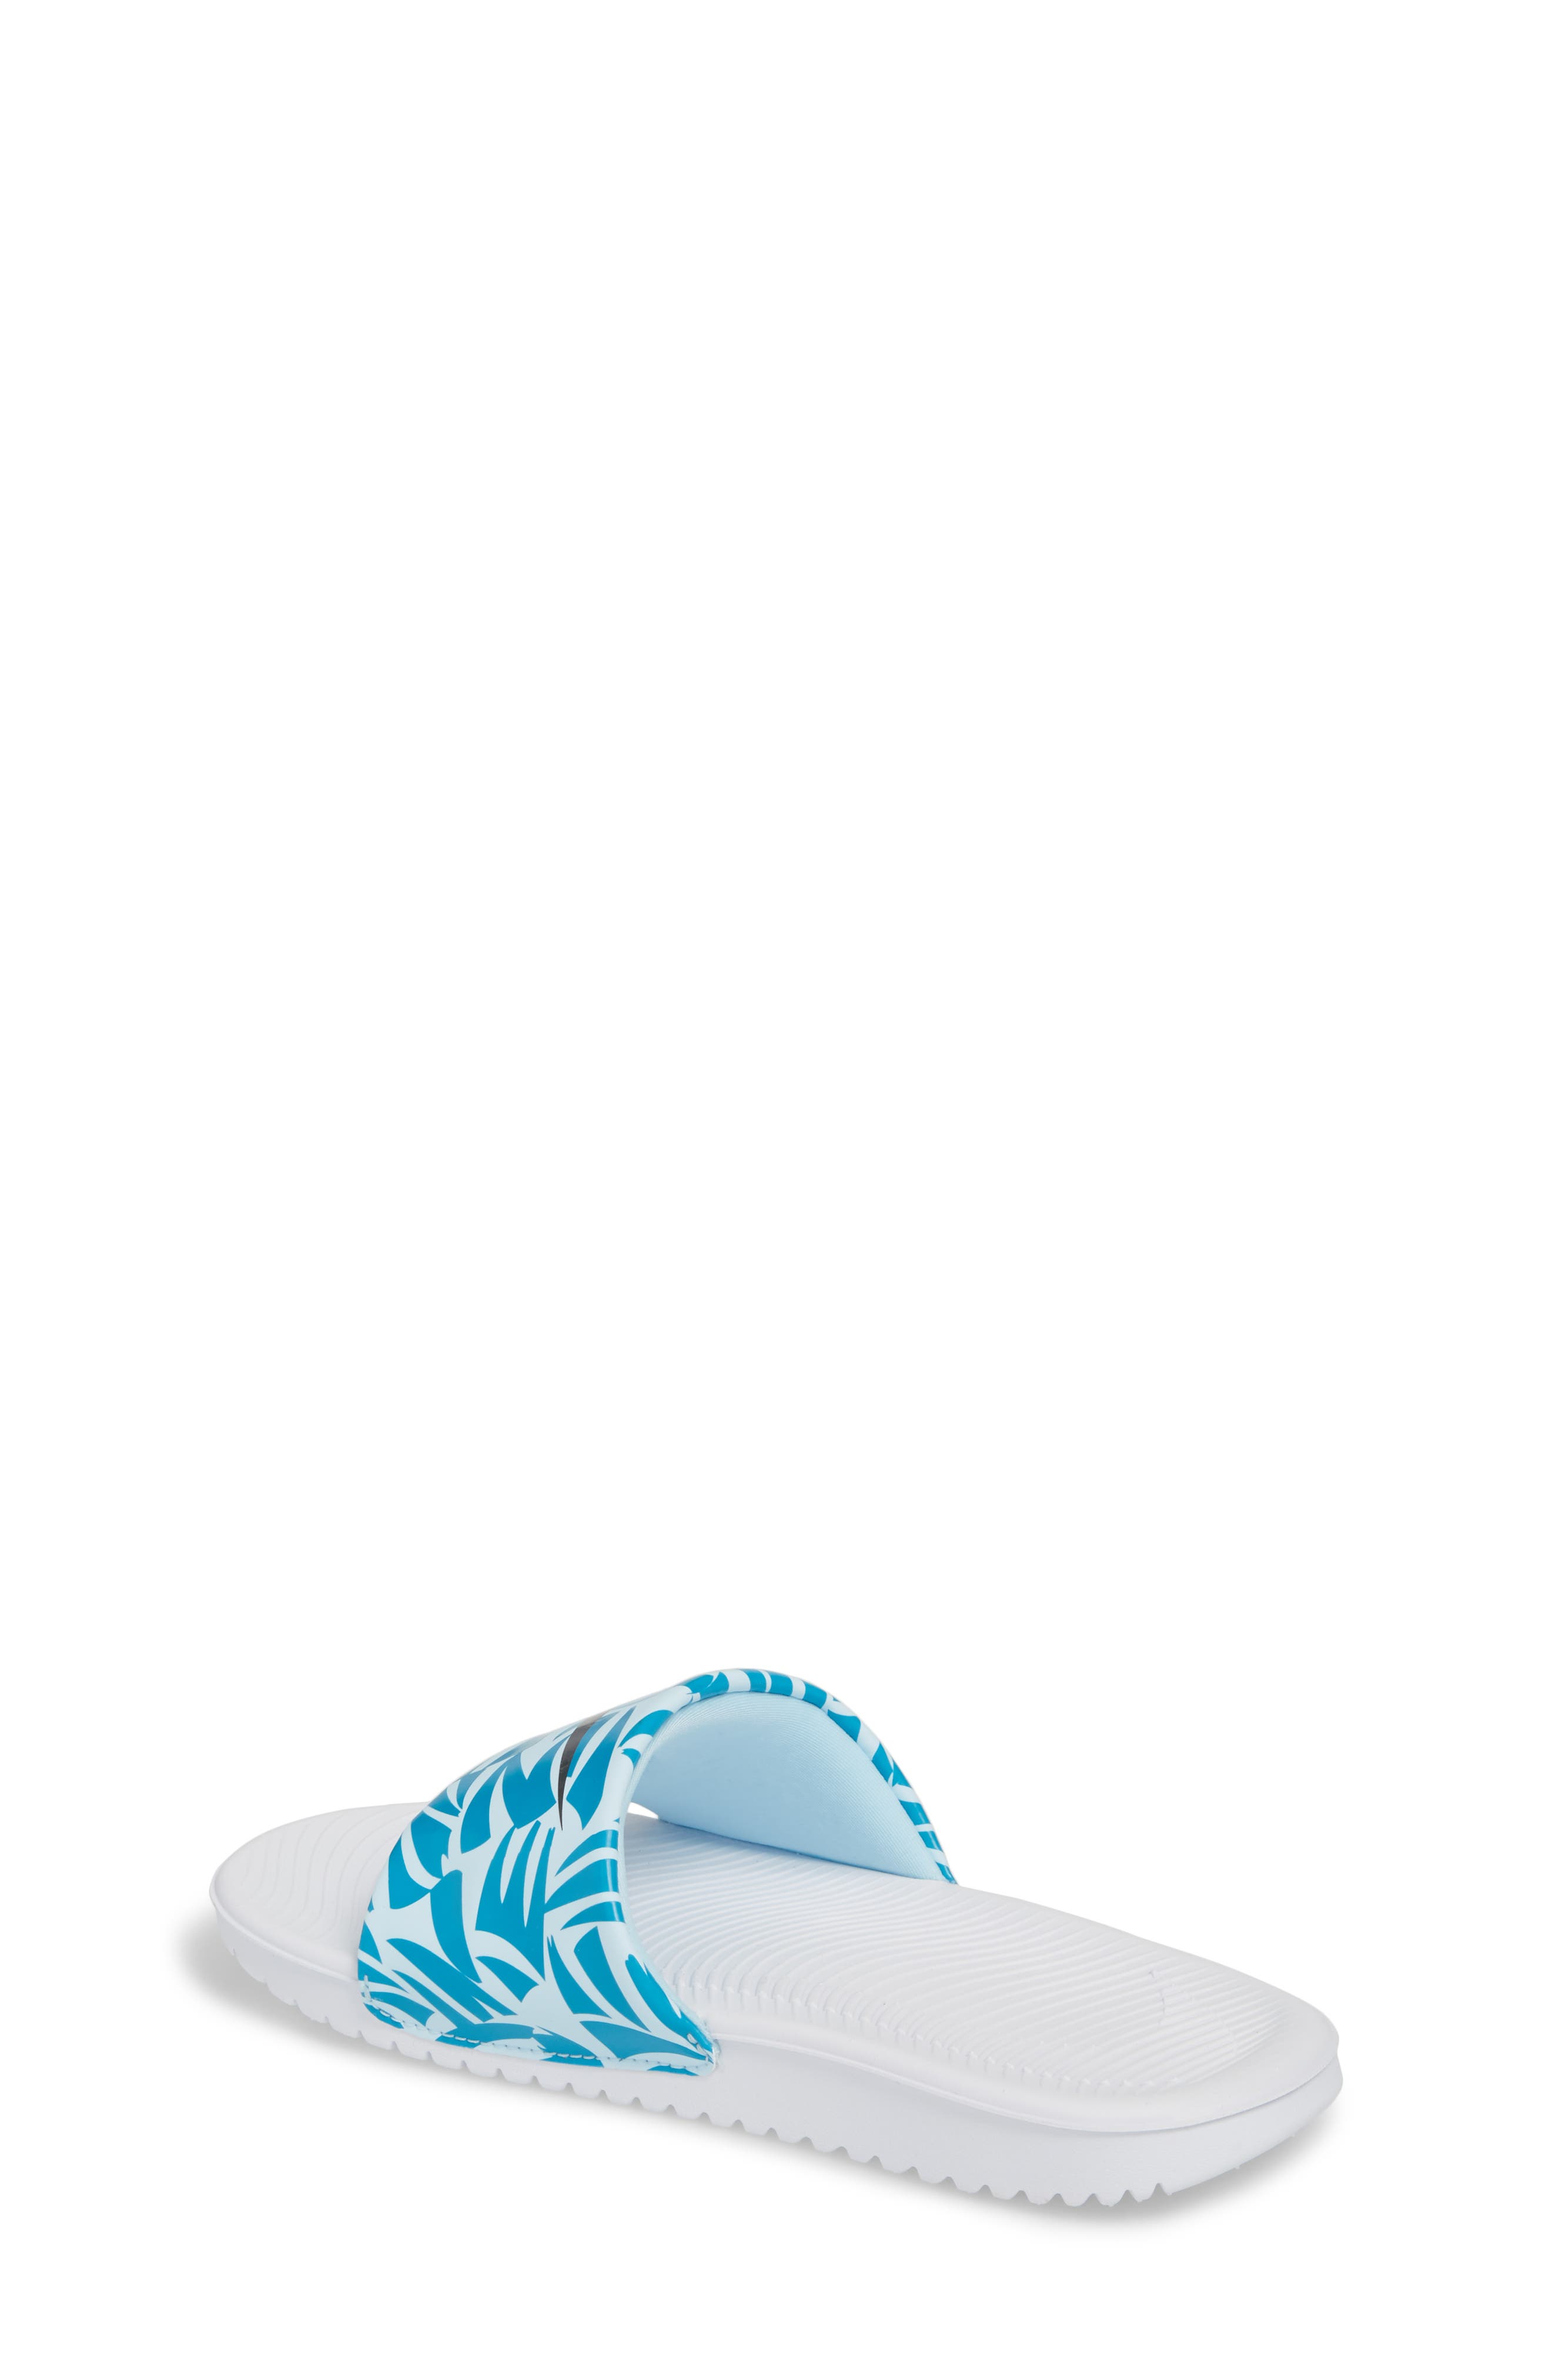 'Kawa' Print Slide Sandal,                             Alternate thumbnail 2, color,                             White/ Anthracite/ Turquoise